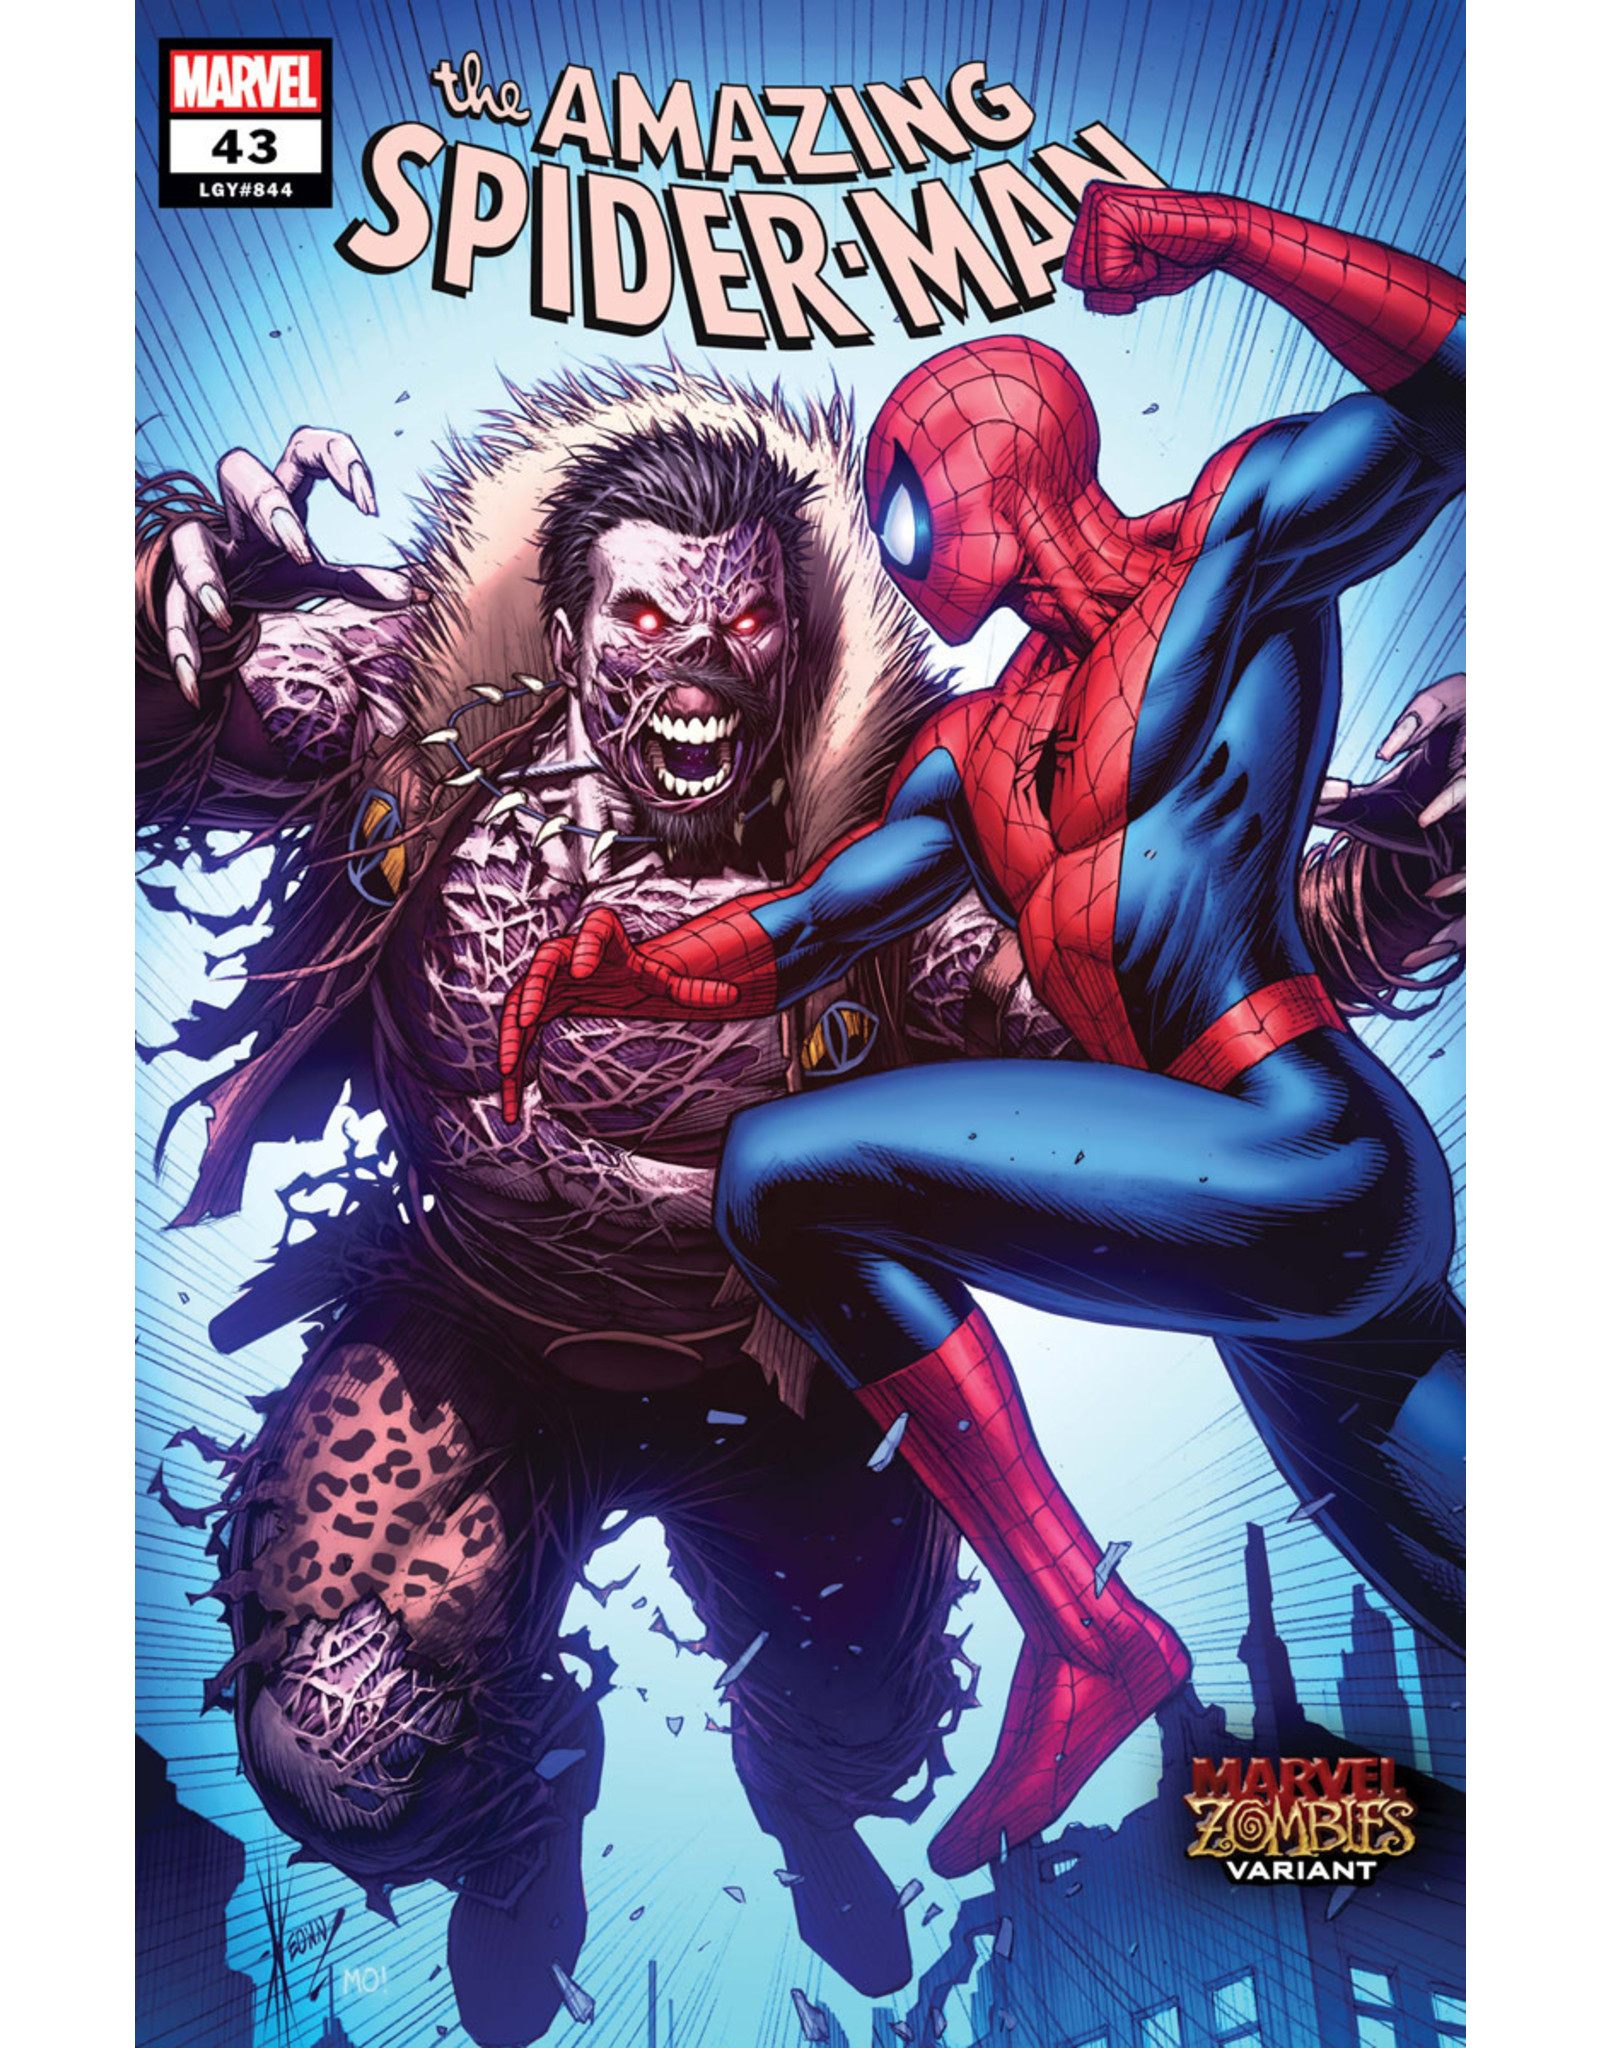 MARVEL COMICS AMAZING SPIDER-MAN #43 KEOWN MARVEL ZOMBIES VAR